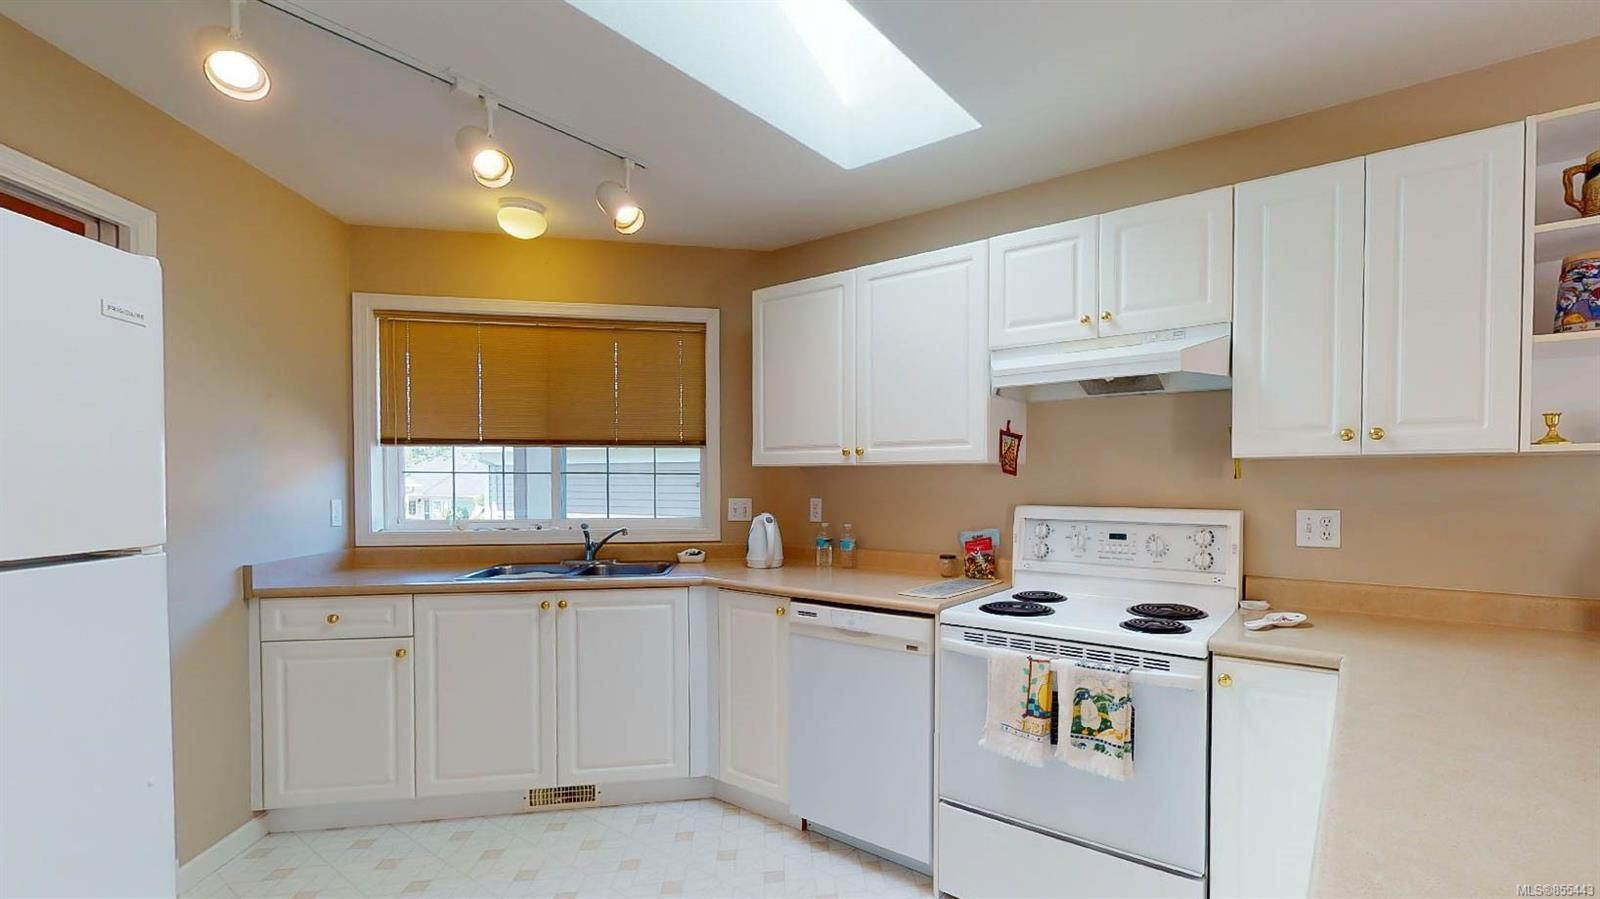 Photo 14: Photos: 1294 Leeward Way in : PQ Qualicum Beach House for sale (Parksville/Qualicum)  : MLS®# 855443